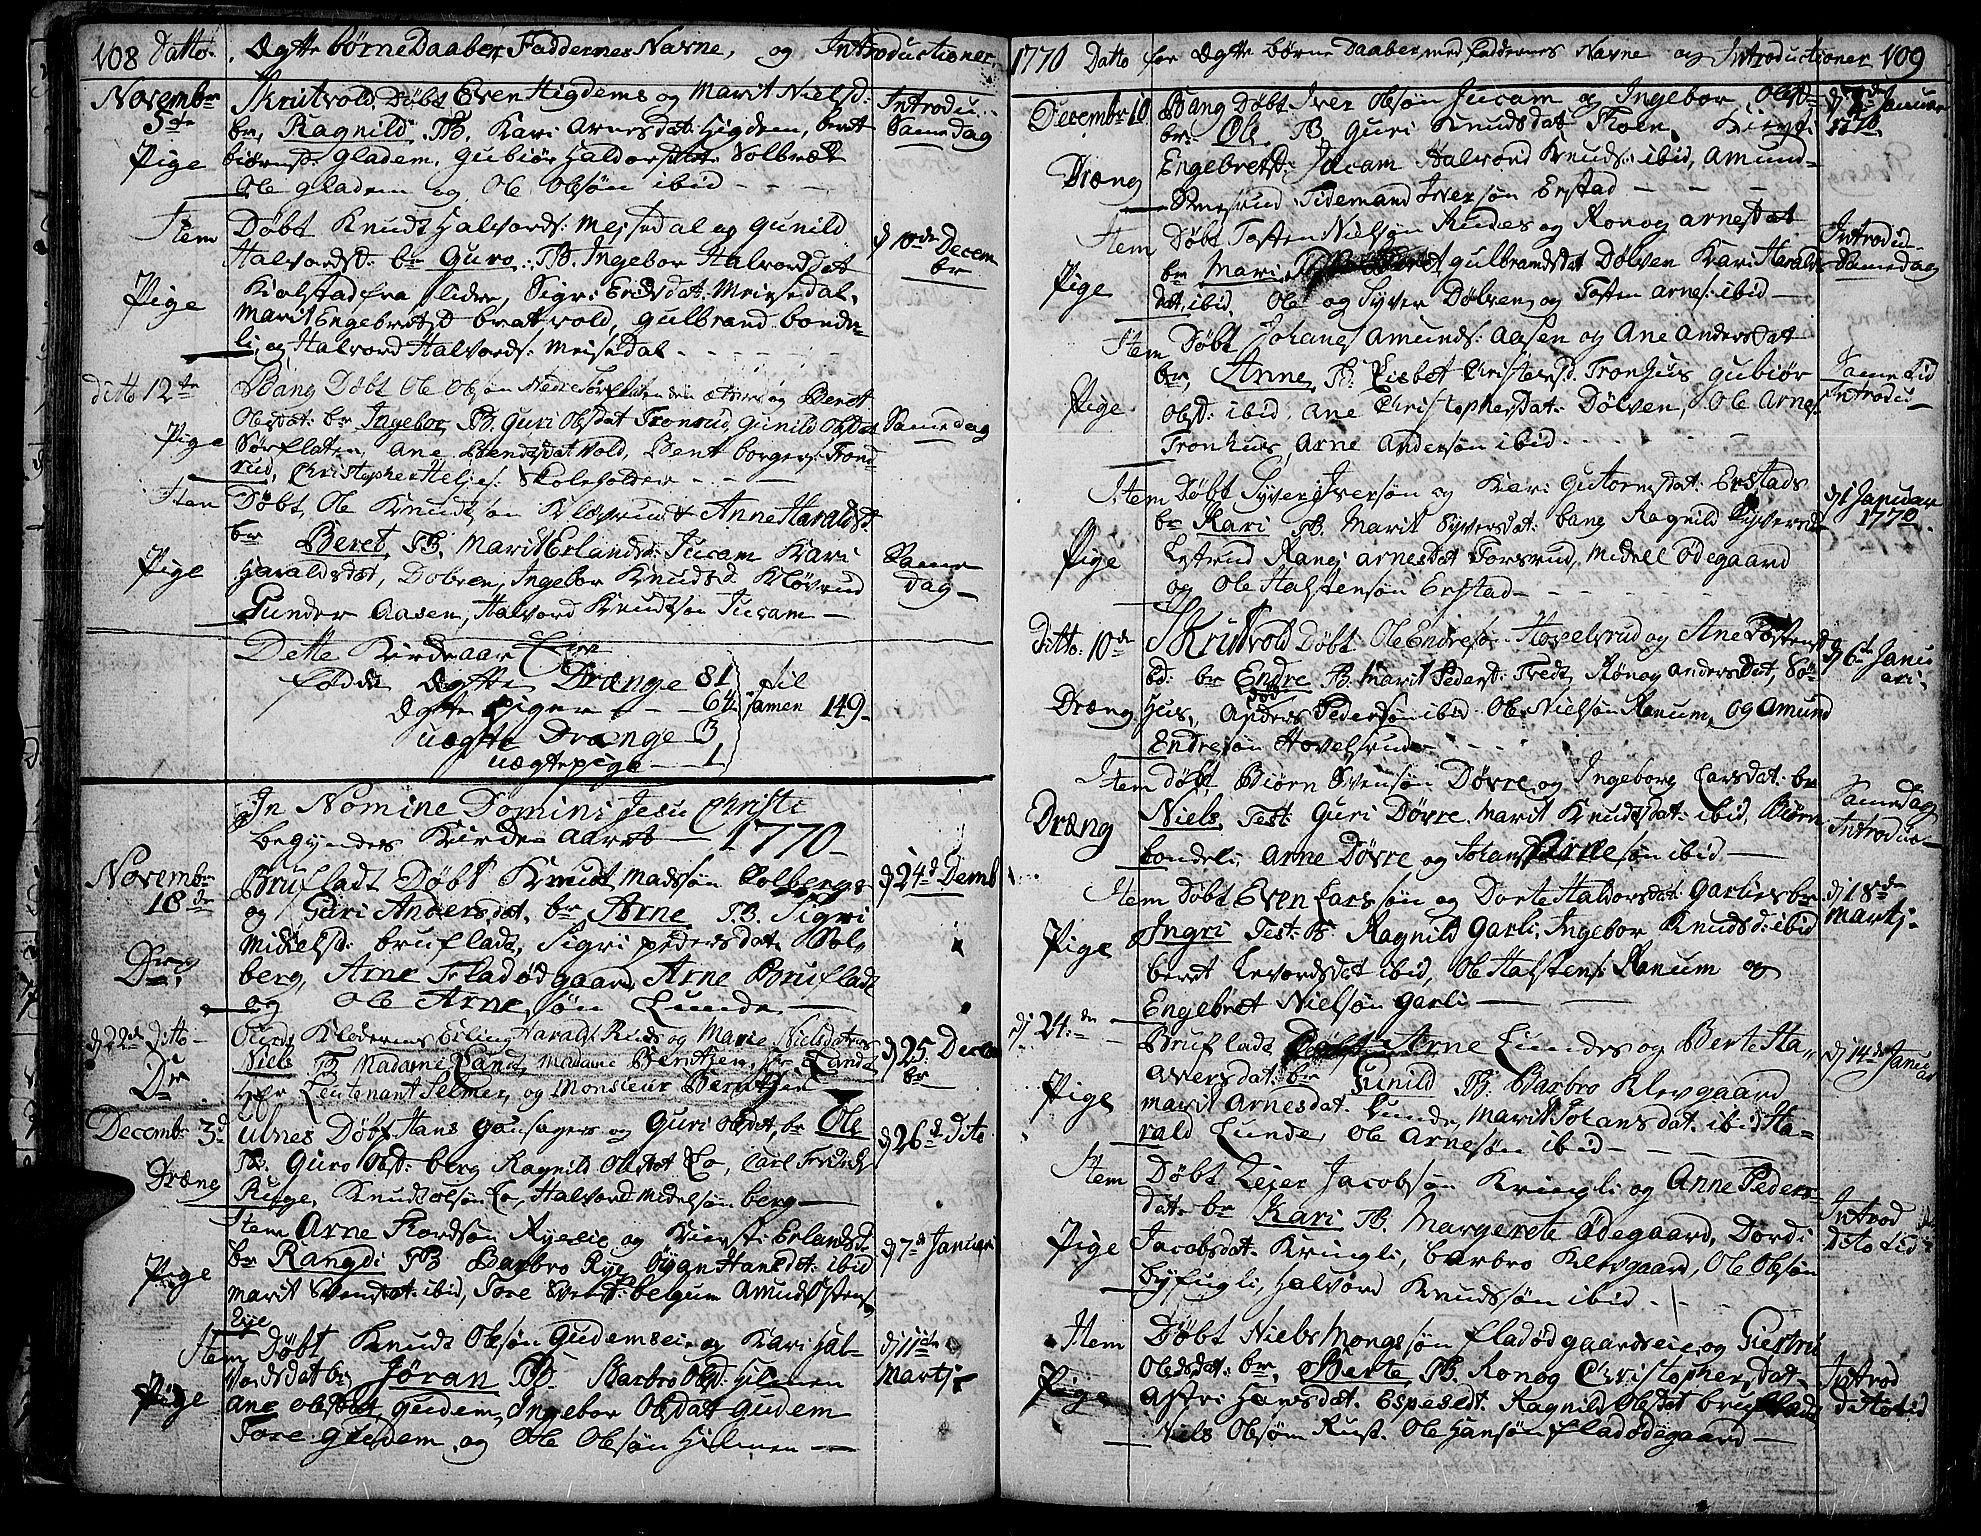 SAH, Aurdal prestekontor, Ministerialbok nr. 5, 1763-1781, s. 108-109